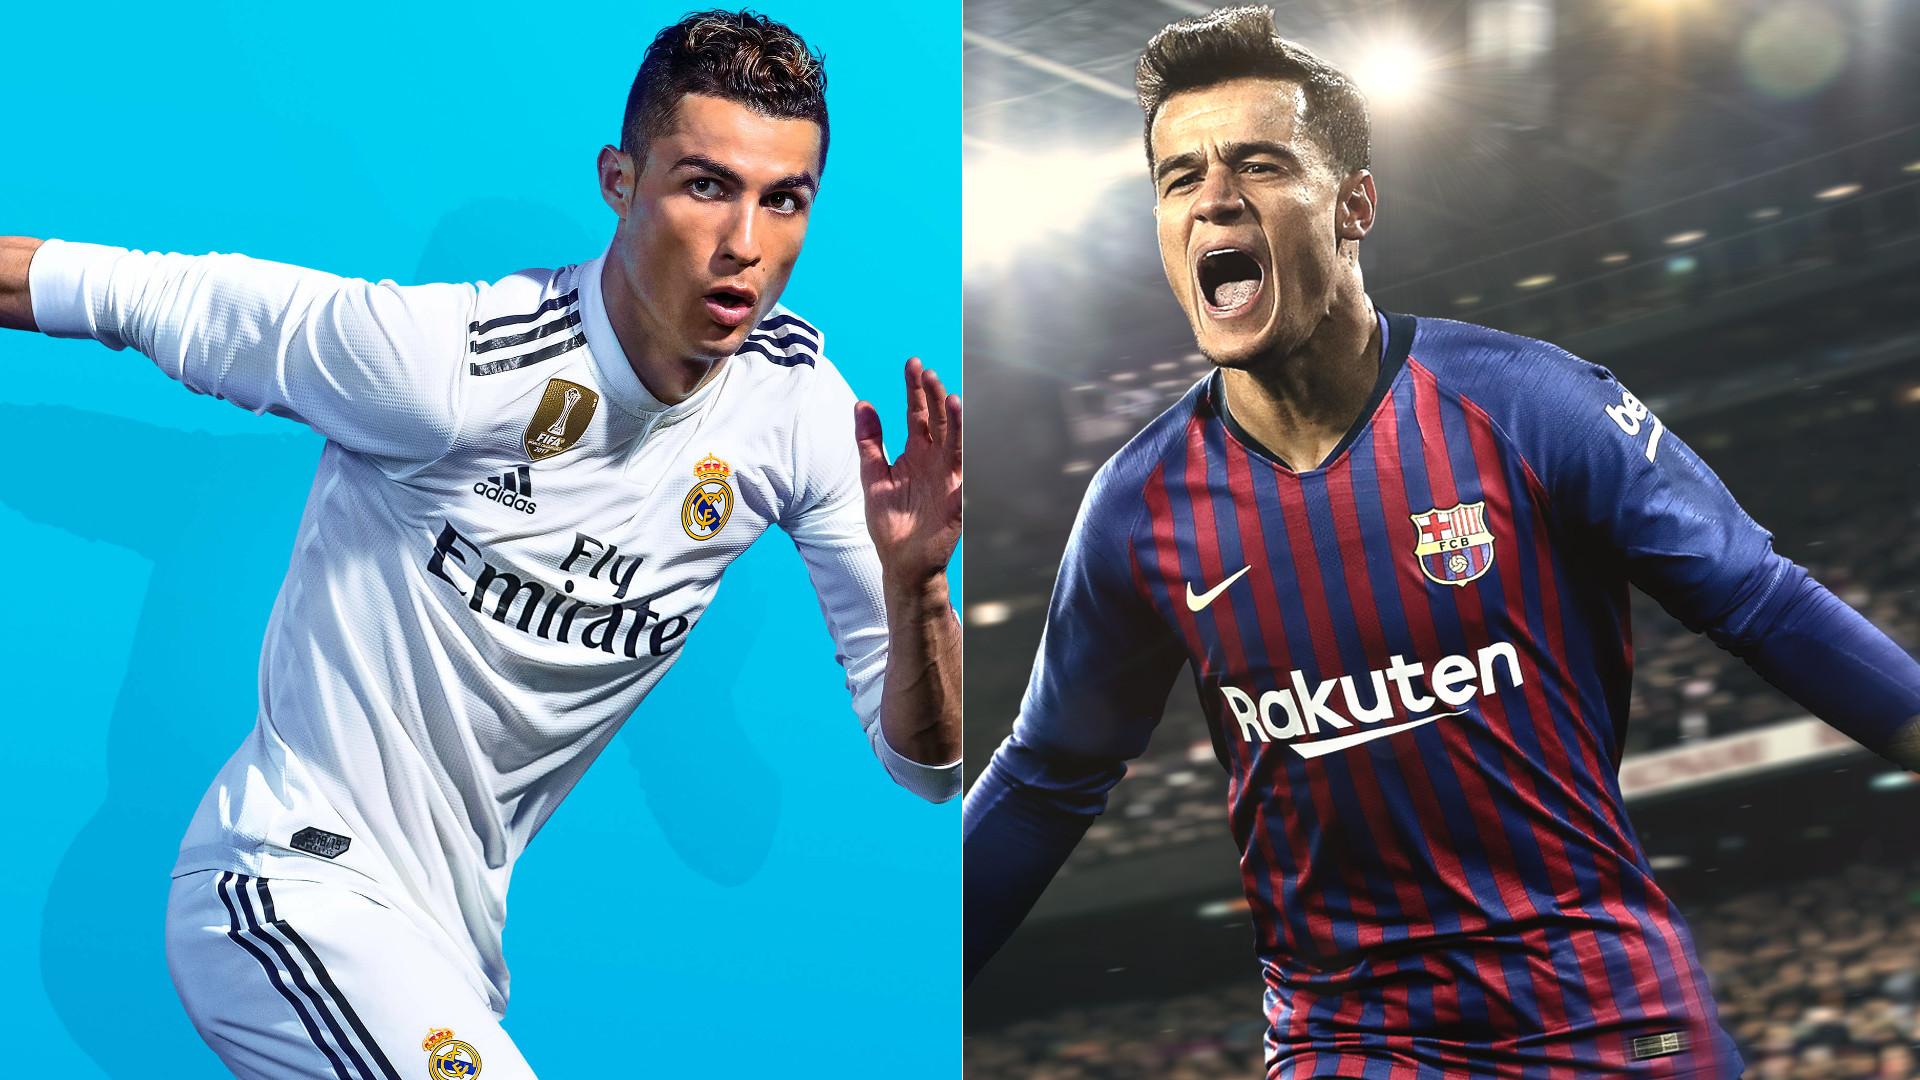 Fifa-19-pro-evolution-soccer-2019-review_1g059xq6err0y1wfl17skjodcs